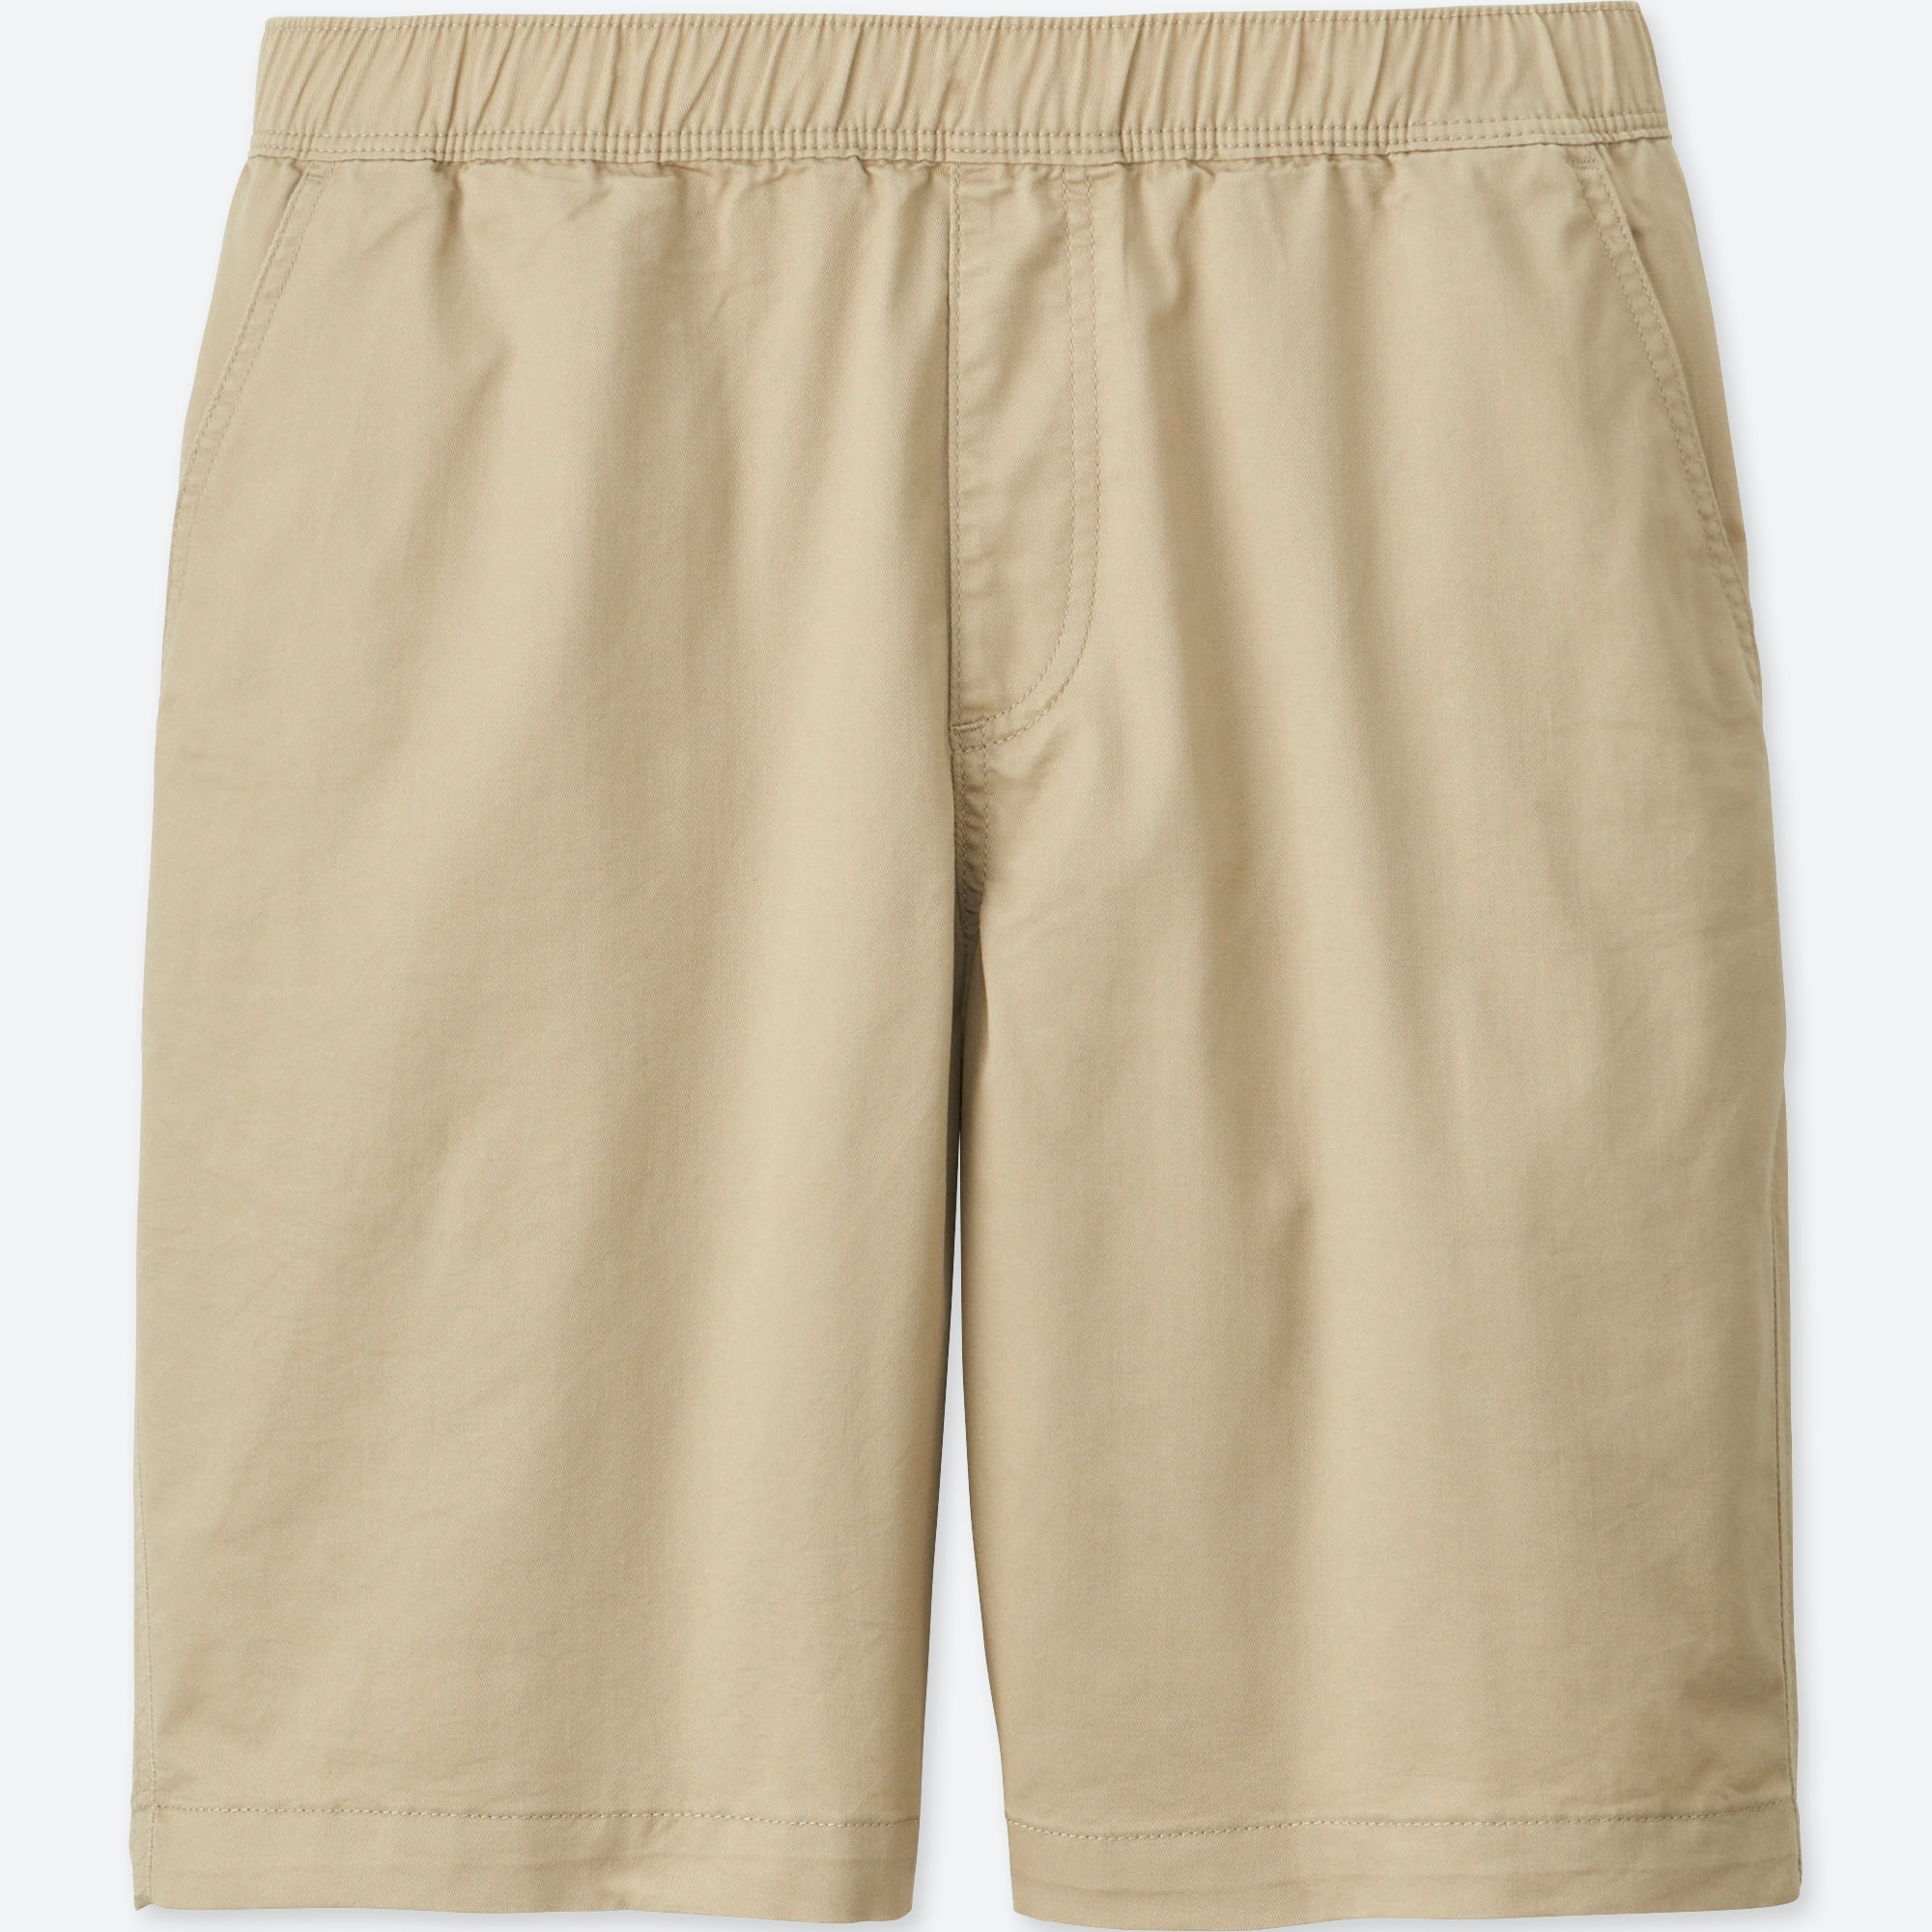 khaki shorts uniqlo